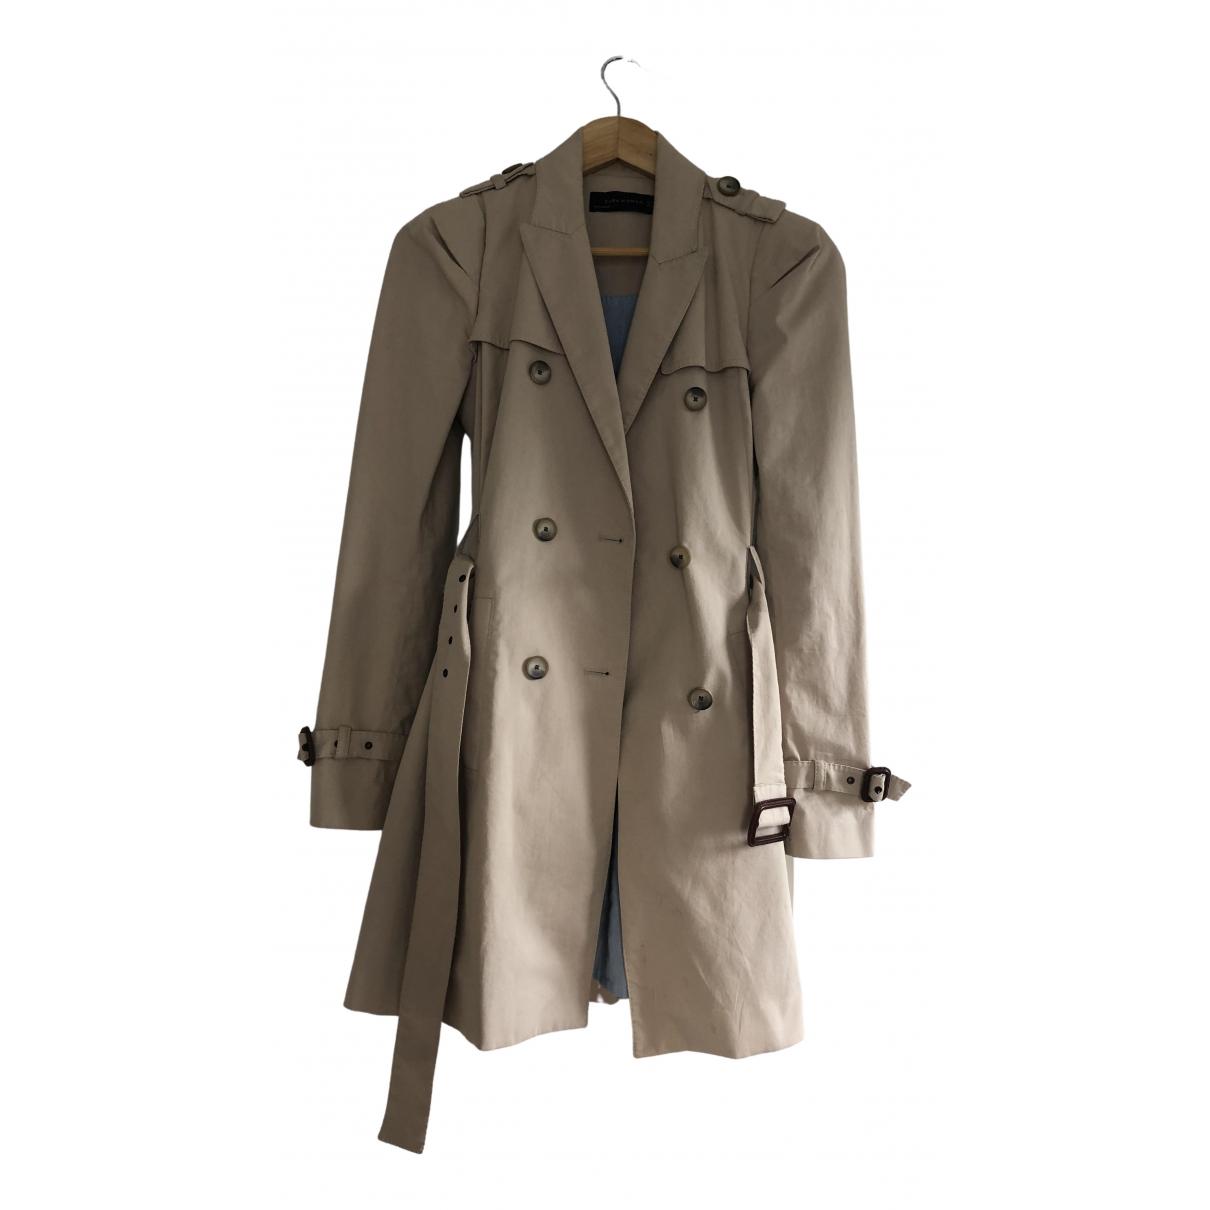 Zara \N Beige Cotton Trench coat for Women S International